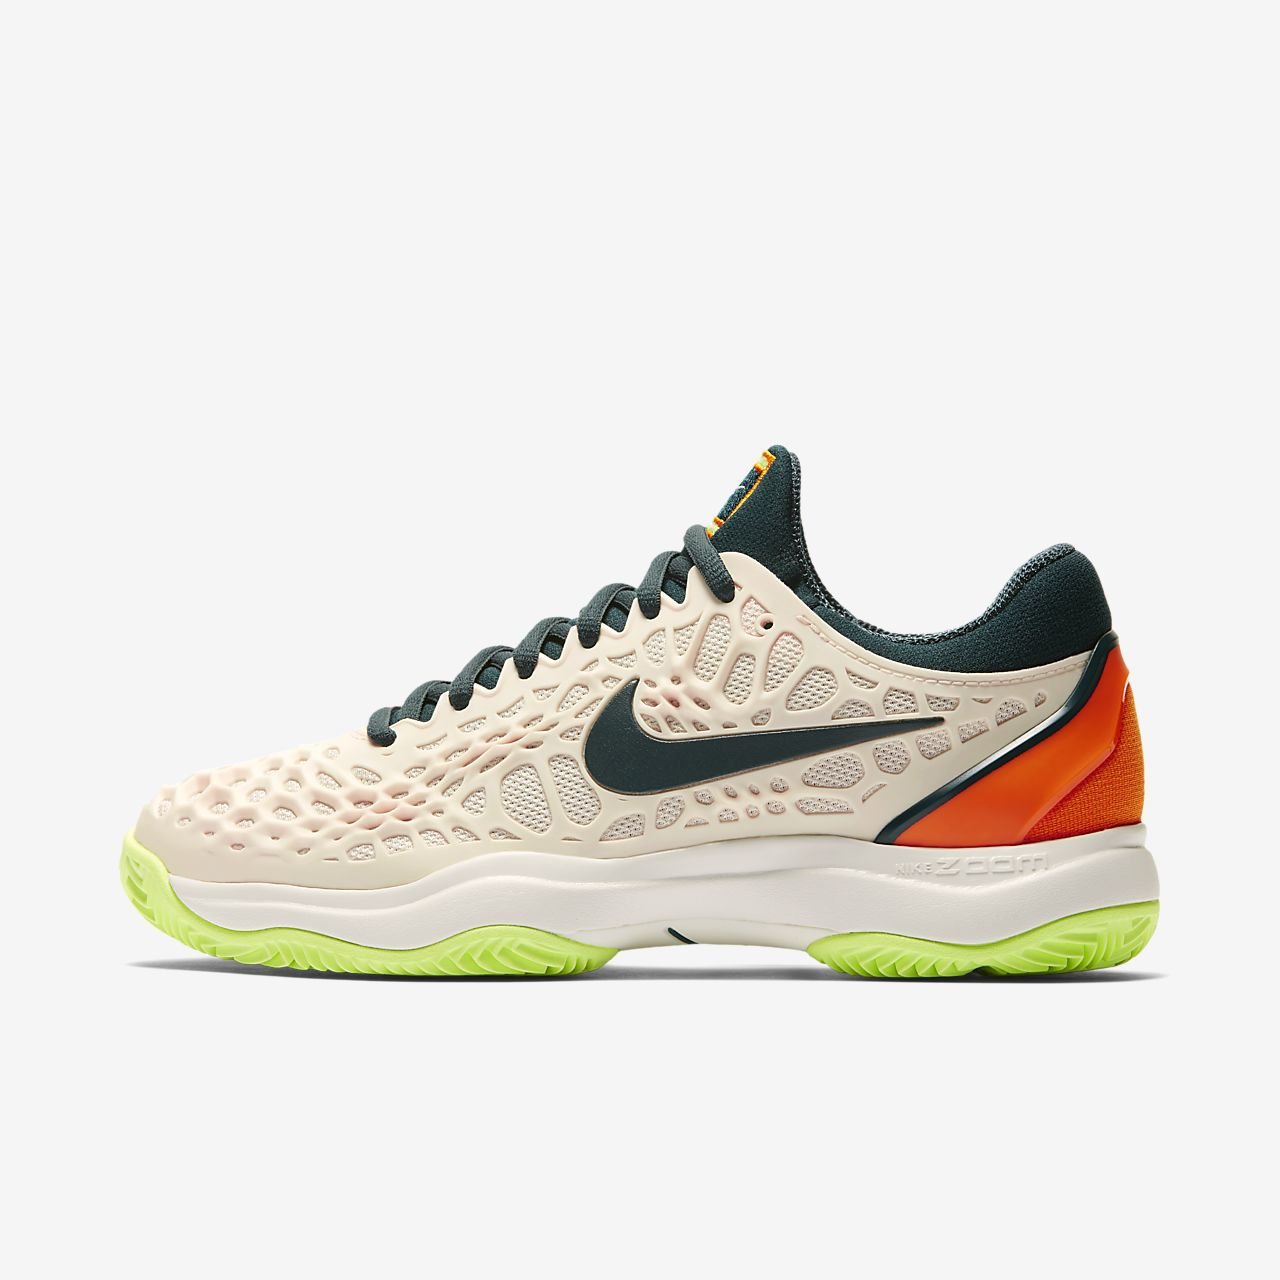 competitive price 88cca 5fb47 ... Scarpa da tennis Nike Zoom Cage 3 Clay - Donna